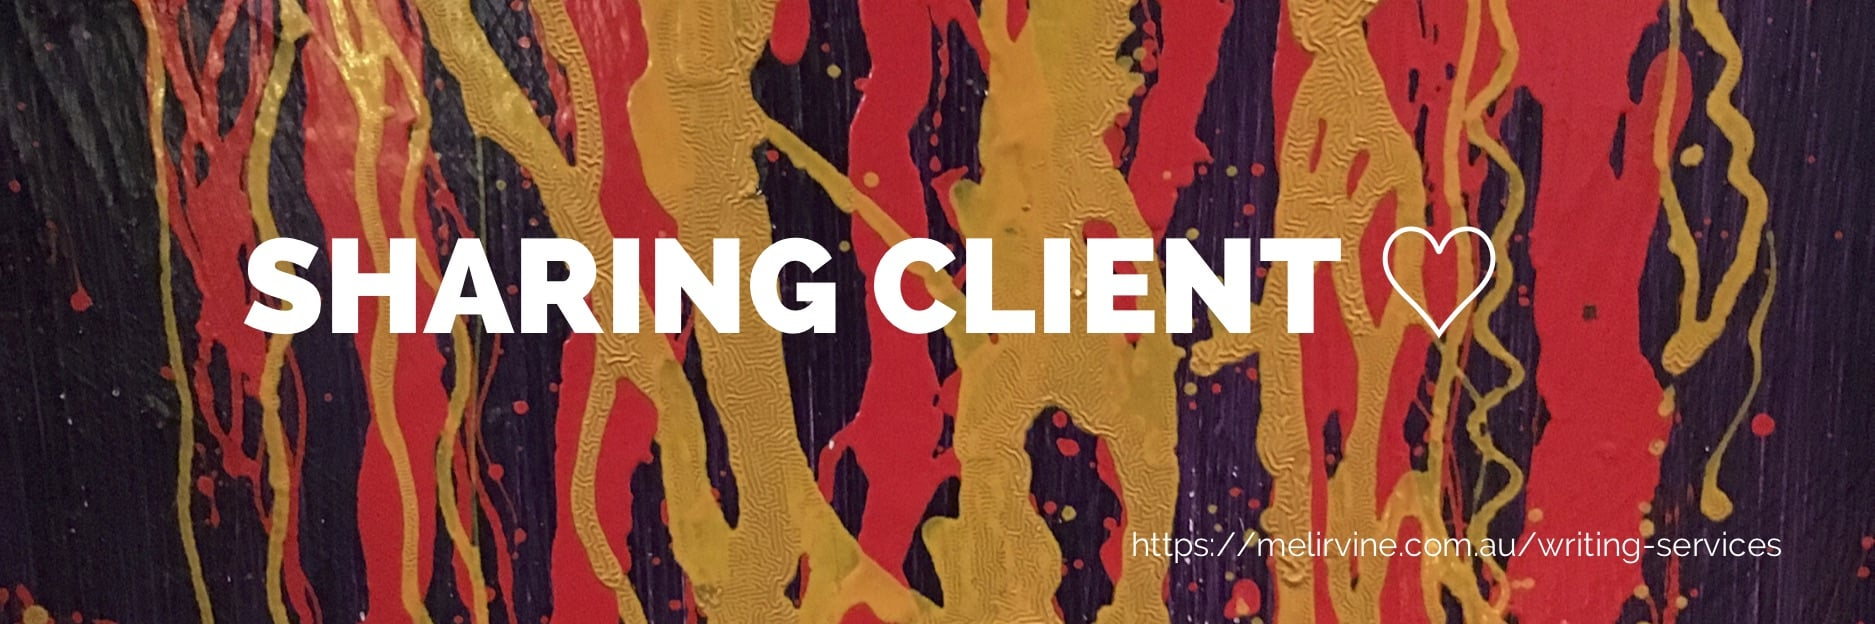 testimonials for Melinda J. Irvine writing services